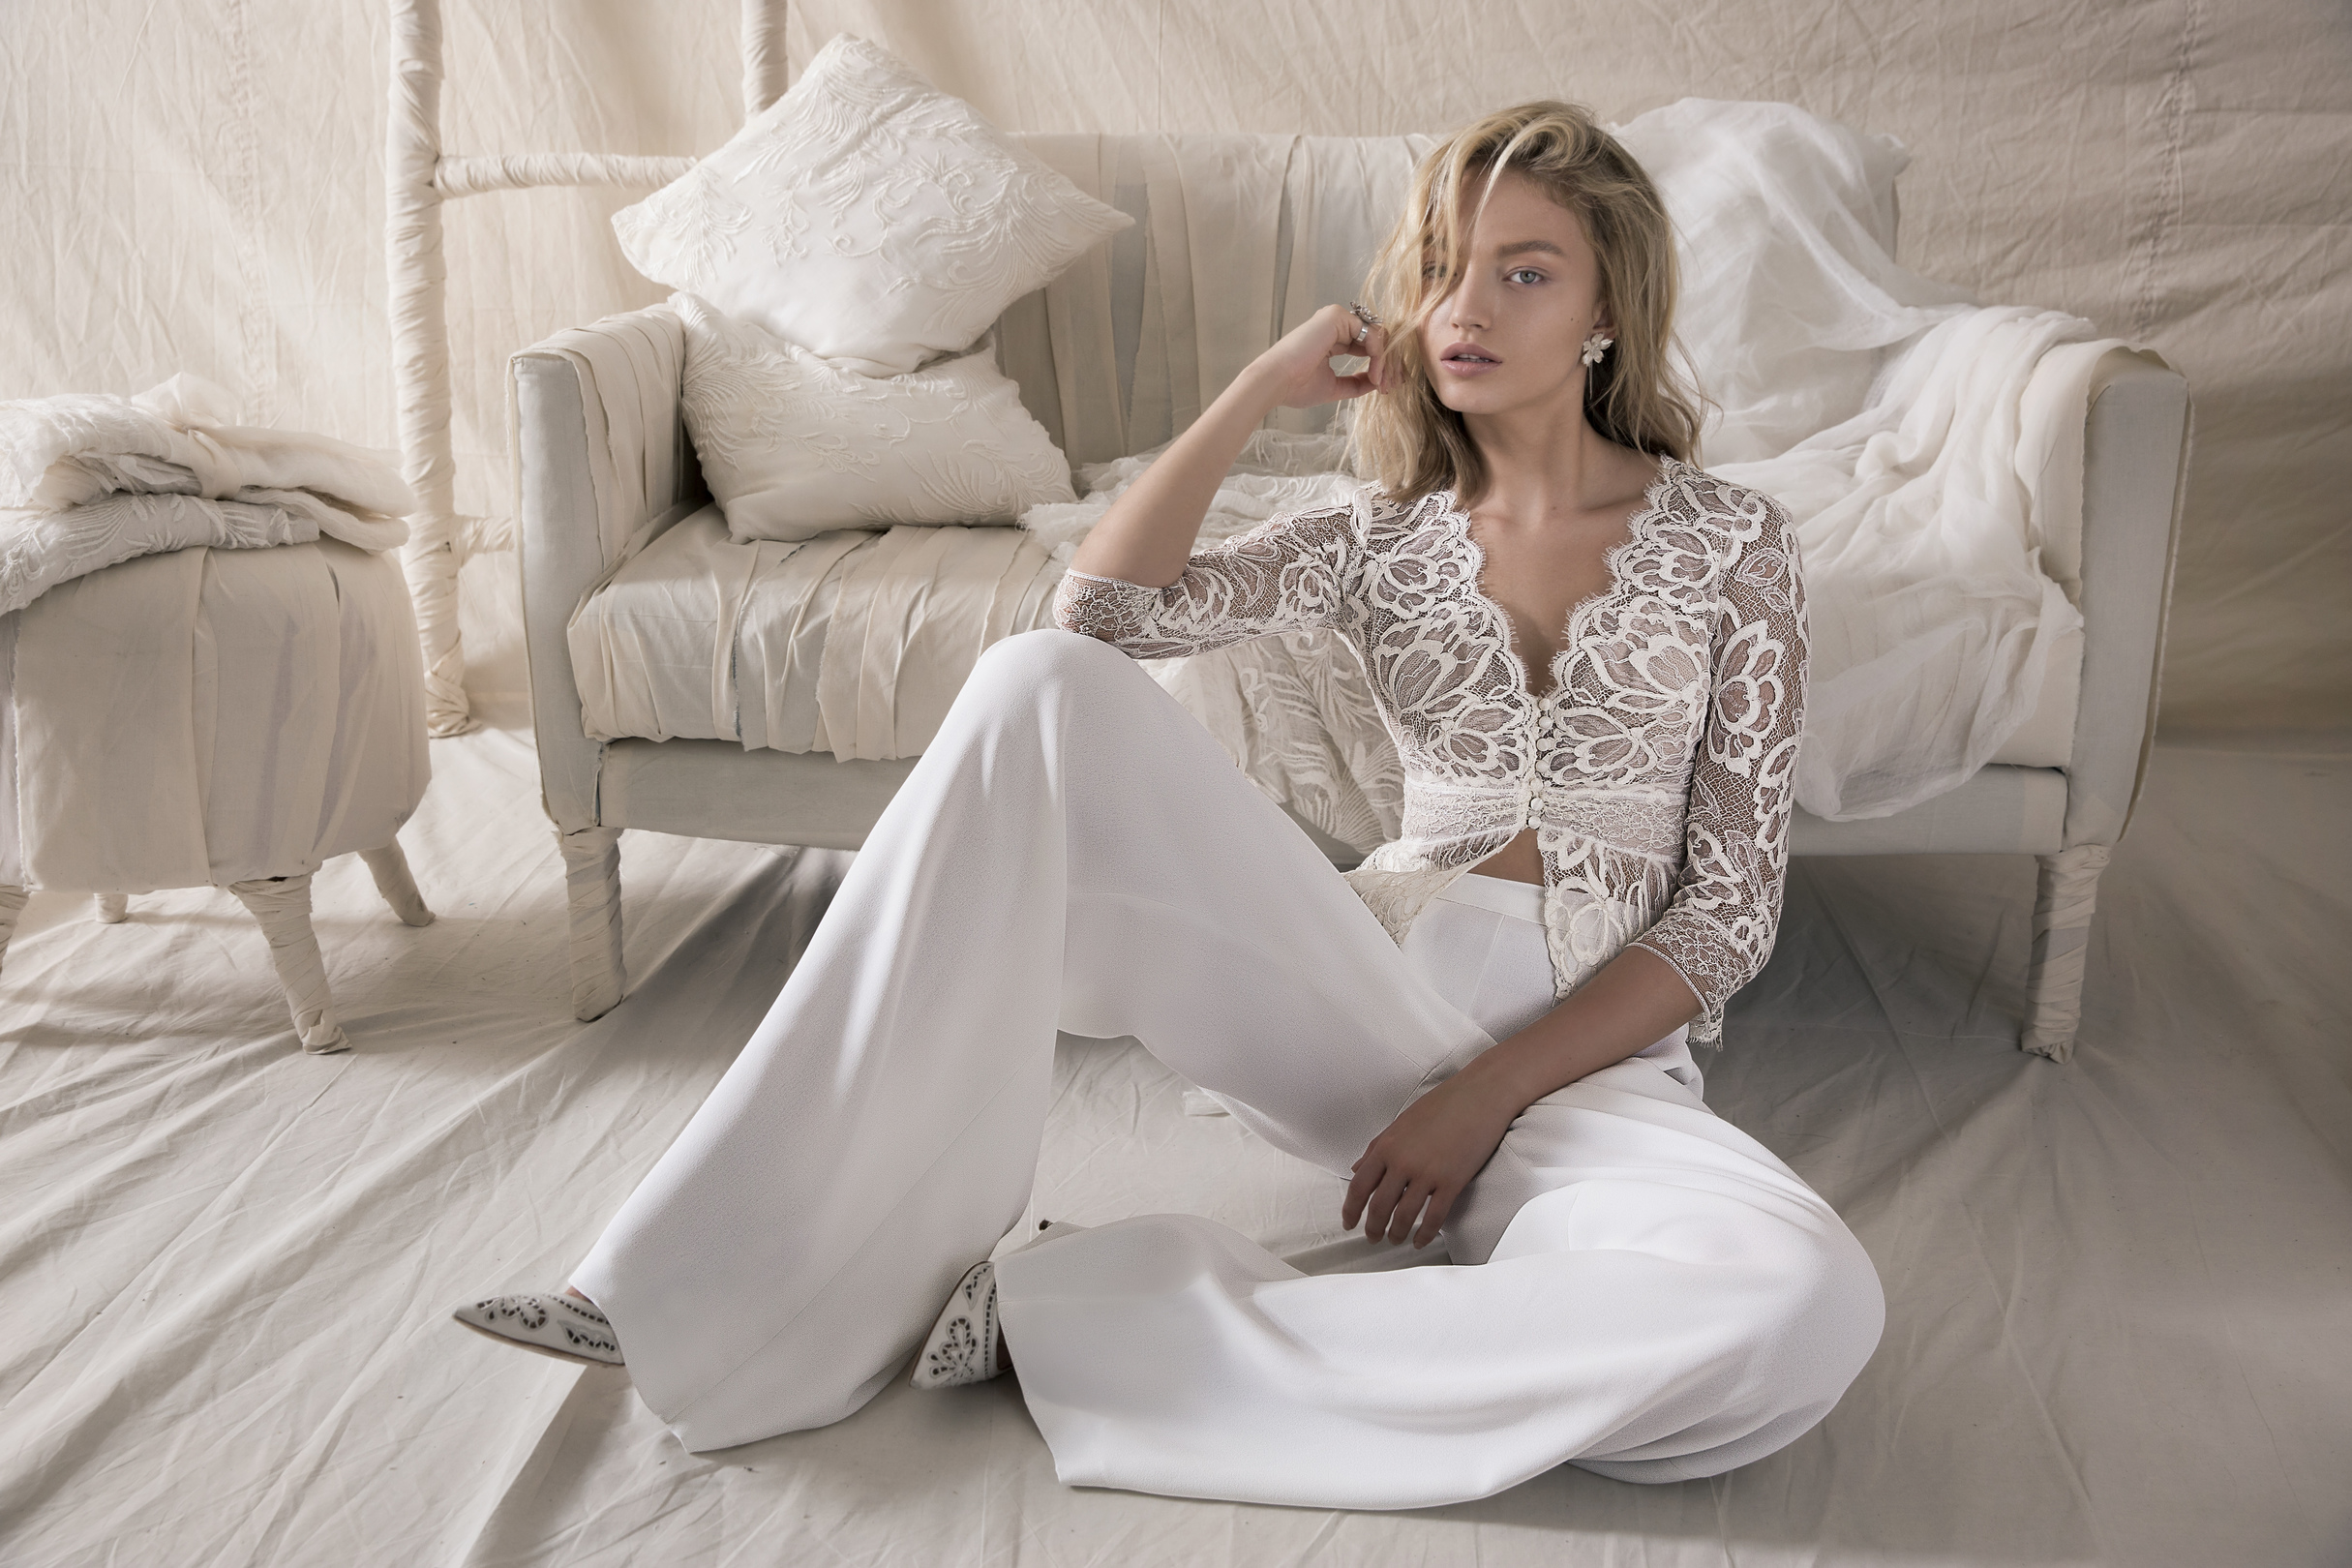 danielle top & evening trousers dress photo